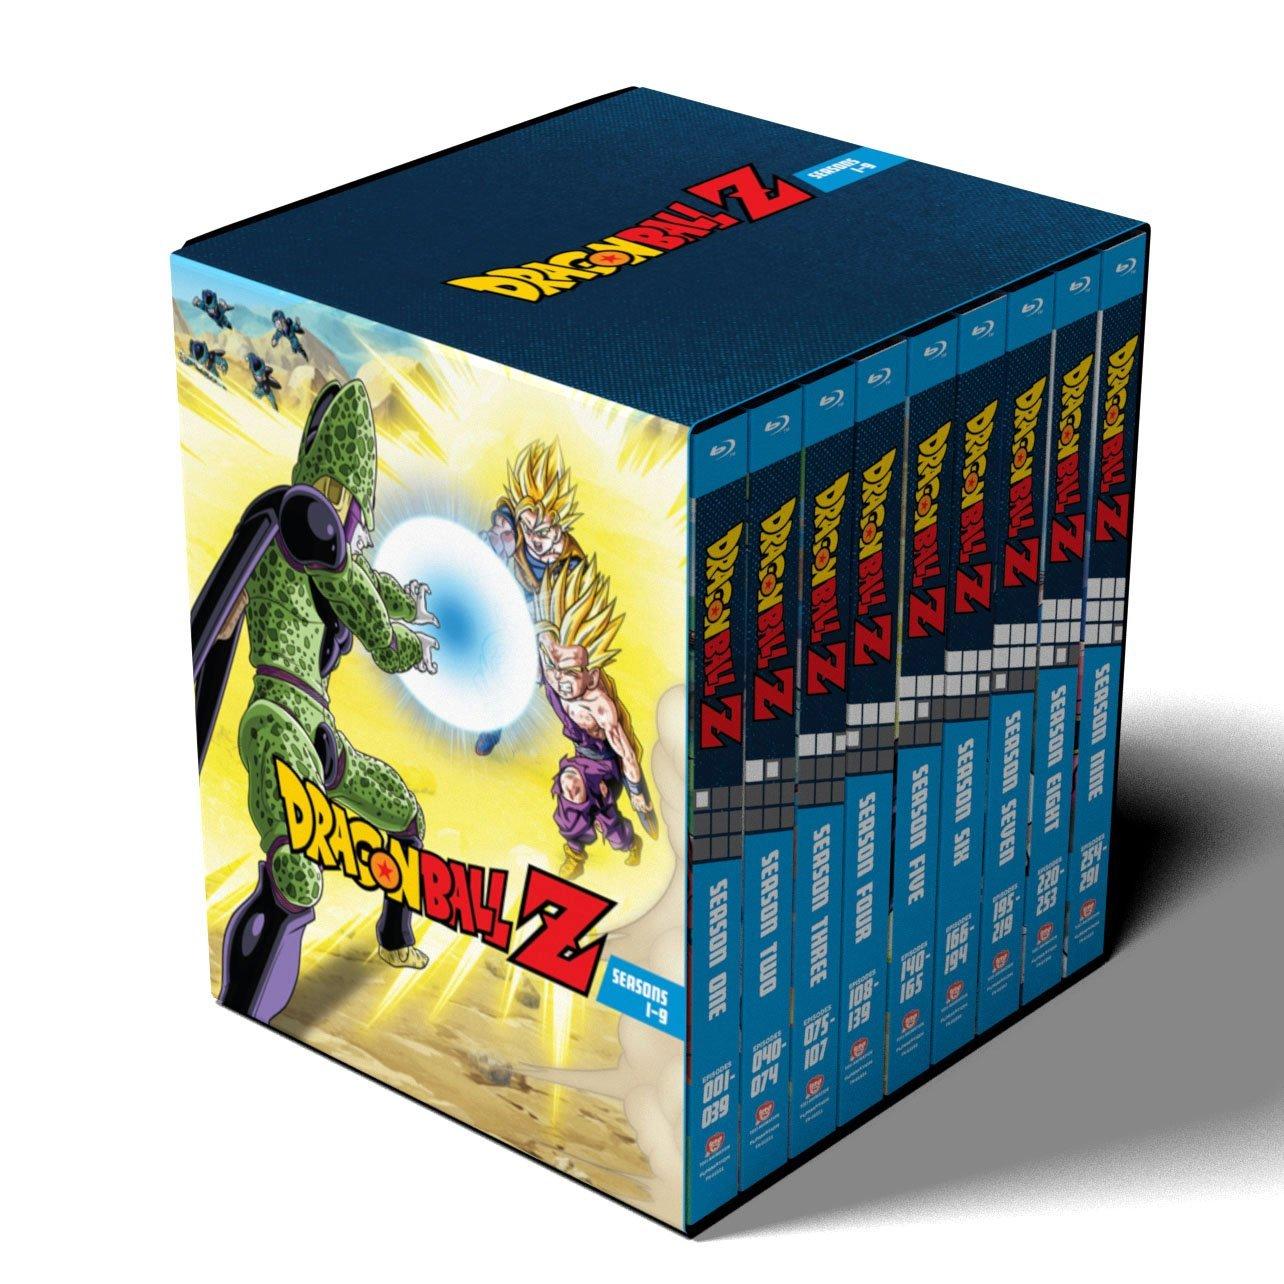 Dragon Ball Z: Seasons 1-9 Collection $126.33 + Free Shipping